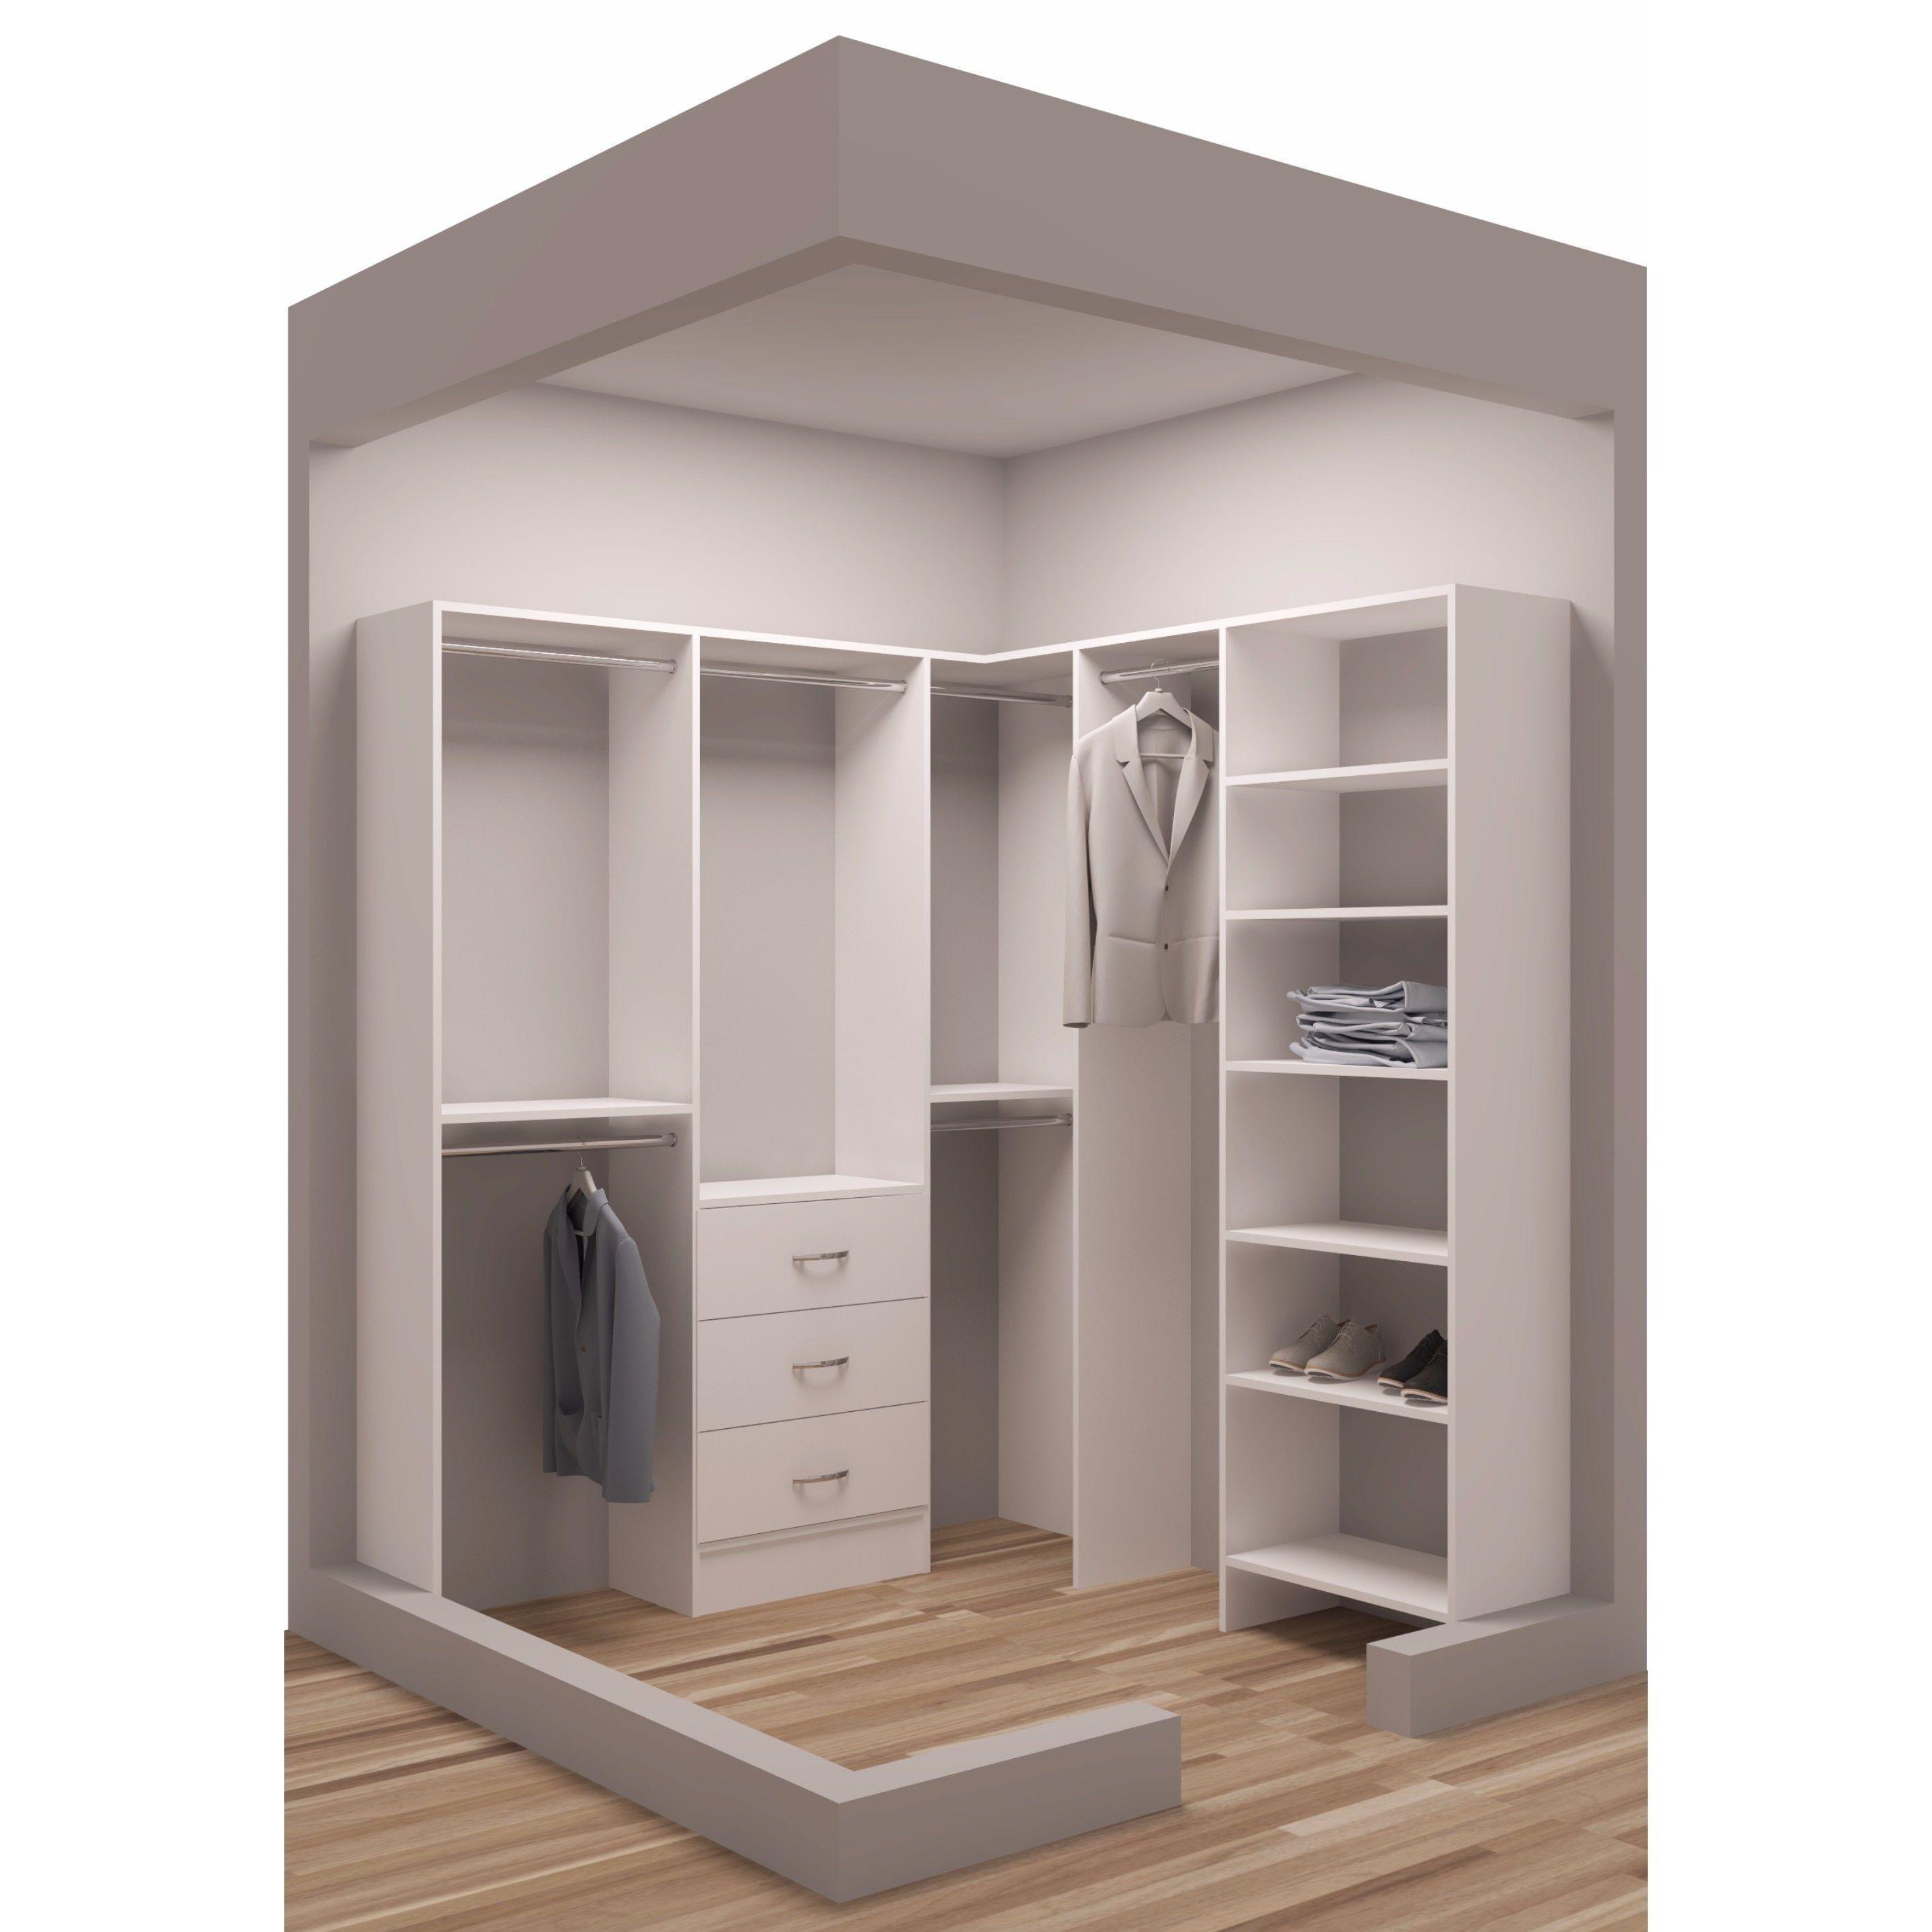 Tidysquares White Wood 75 X 72 25 Walk In Closet System White